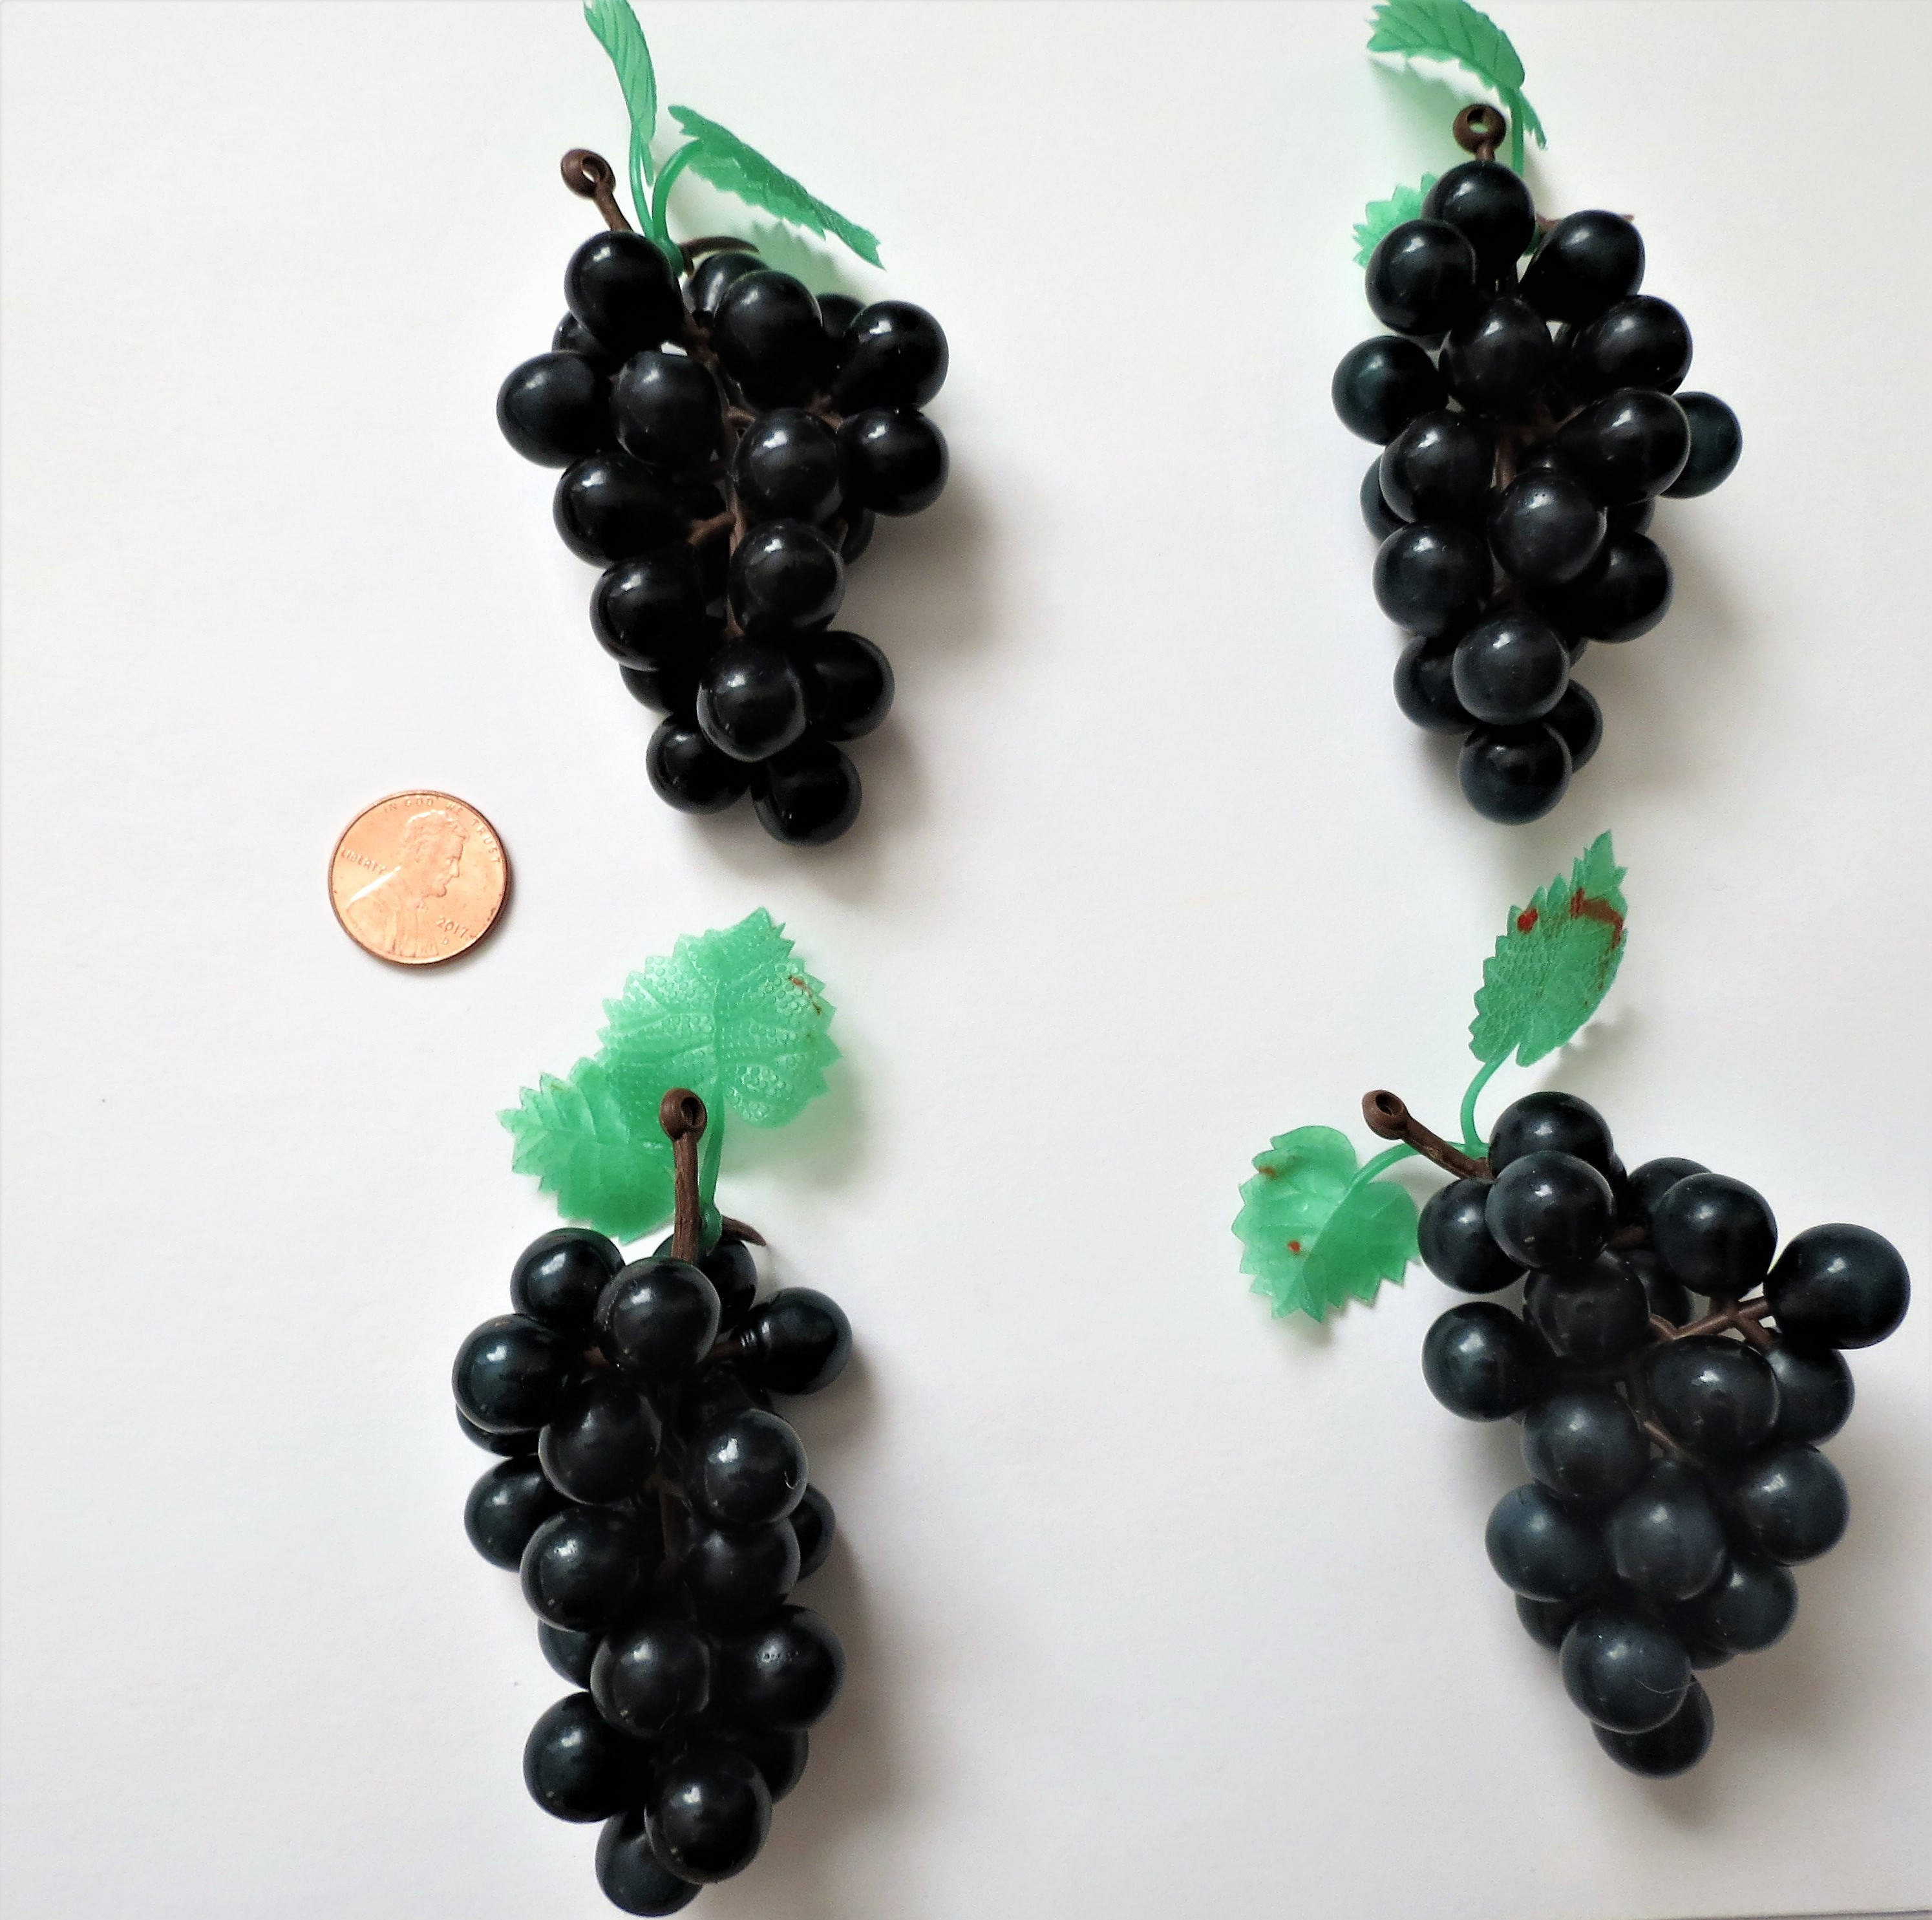 Mini Grapes Lot of 4 Plastic Grapes Wedding Favor Fruit Wine Decor 3 ...